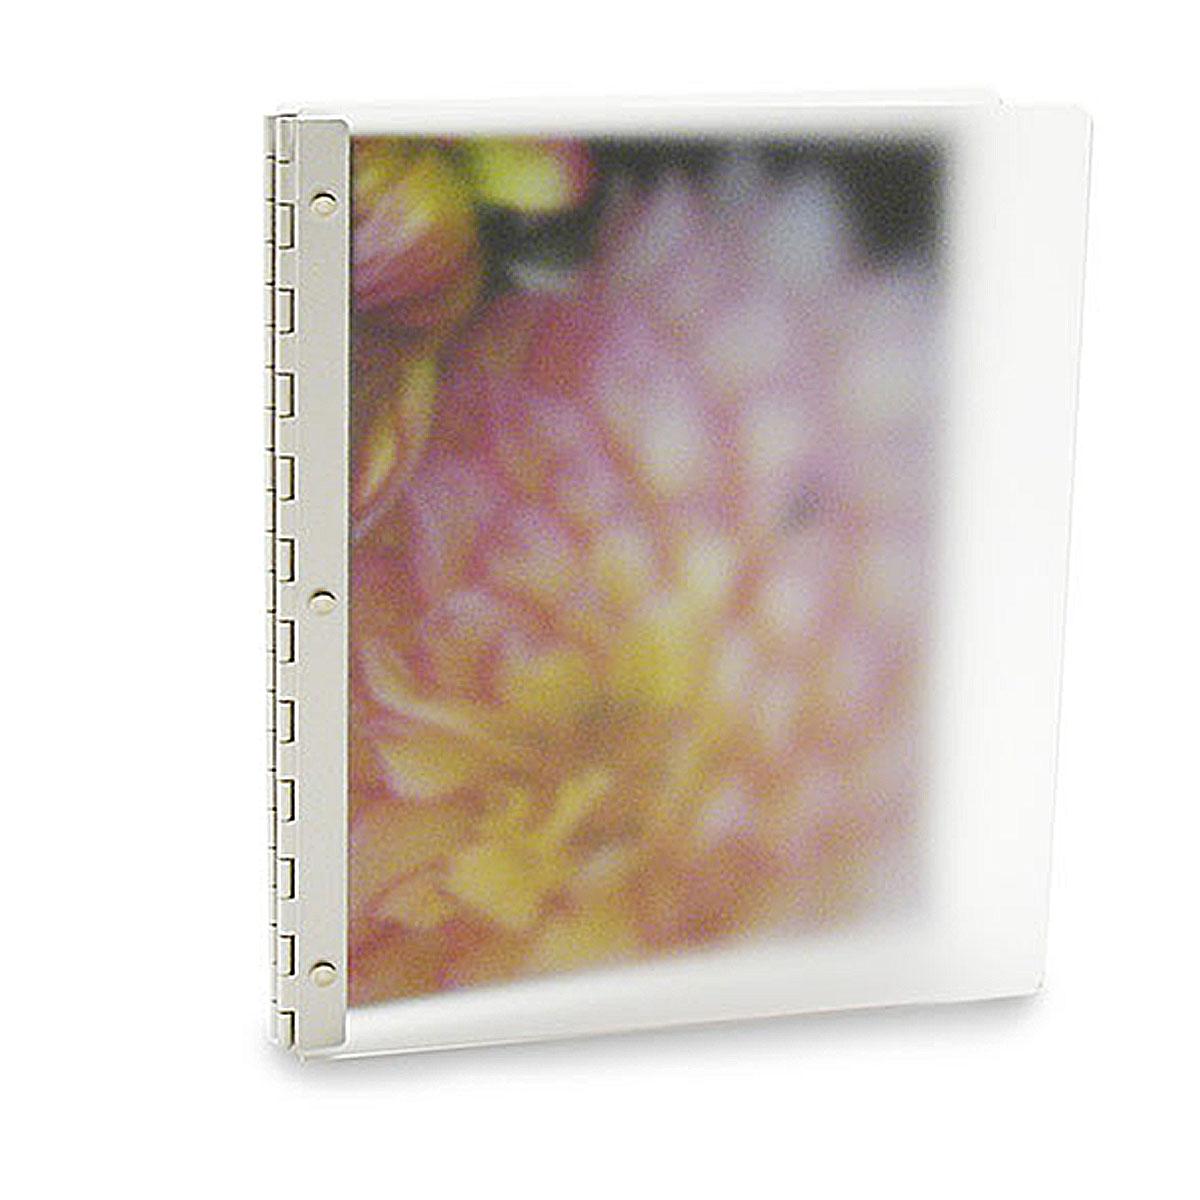 Pina Zangaro Vista 11x8 5 Presentation Book Mist